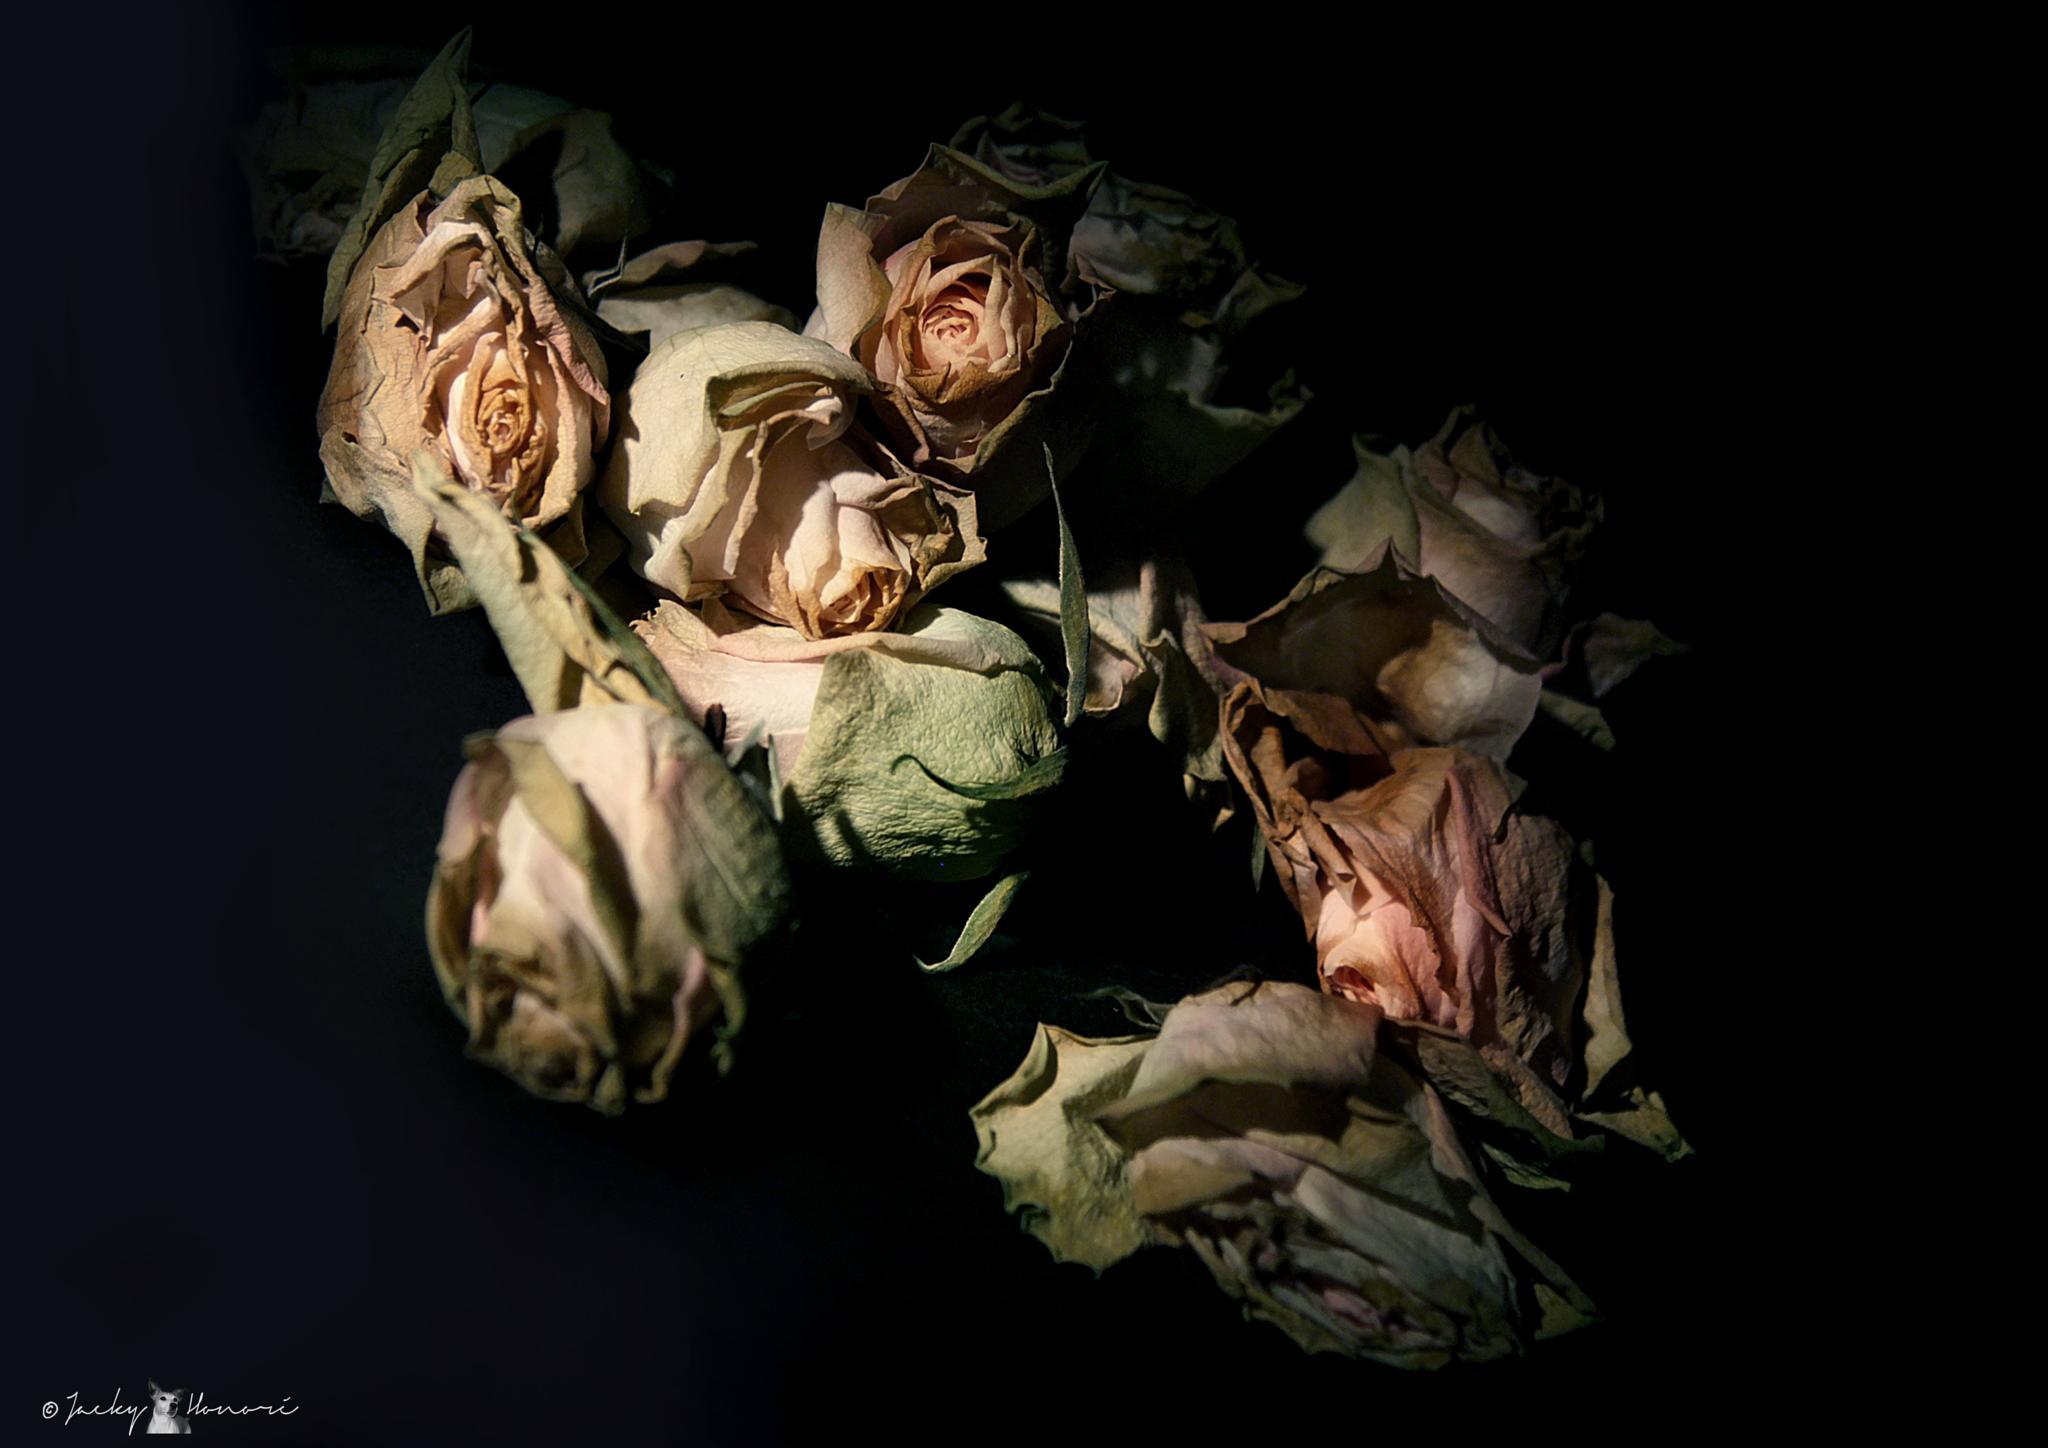 Flowers04 by Jacky Honoré